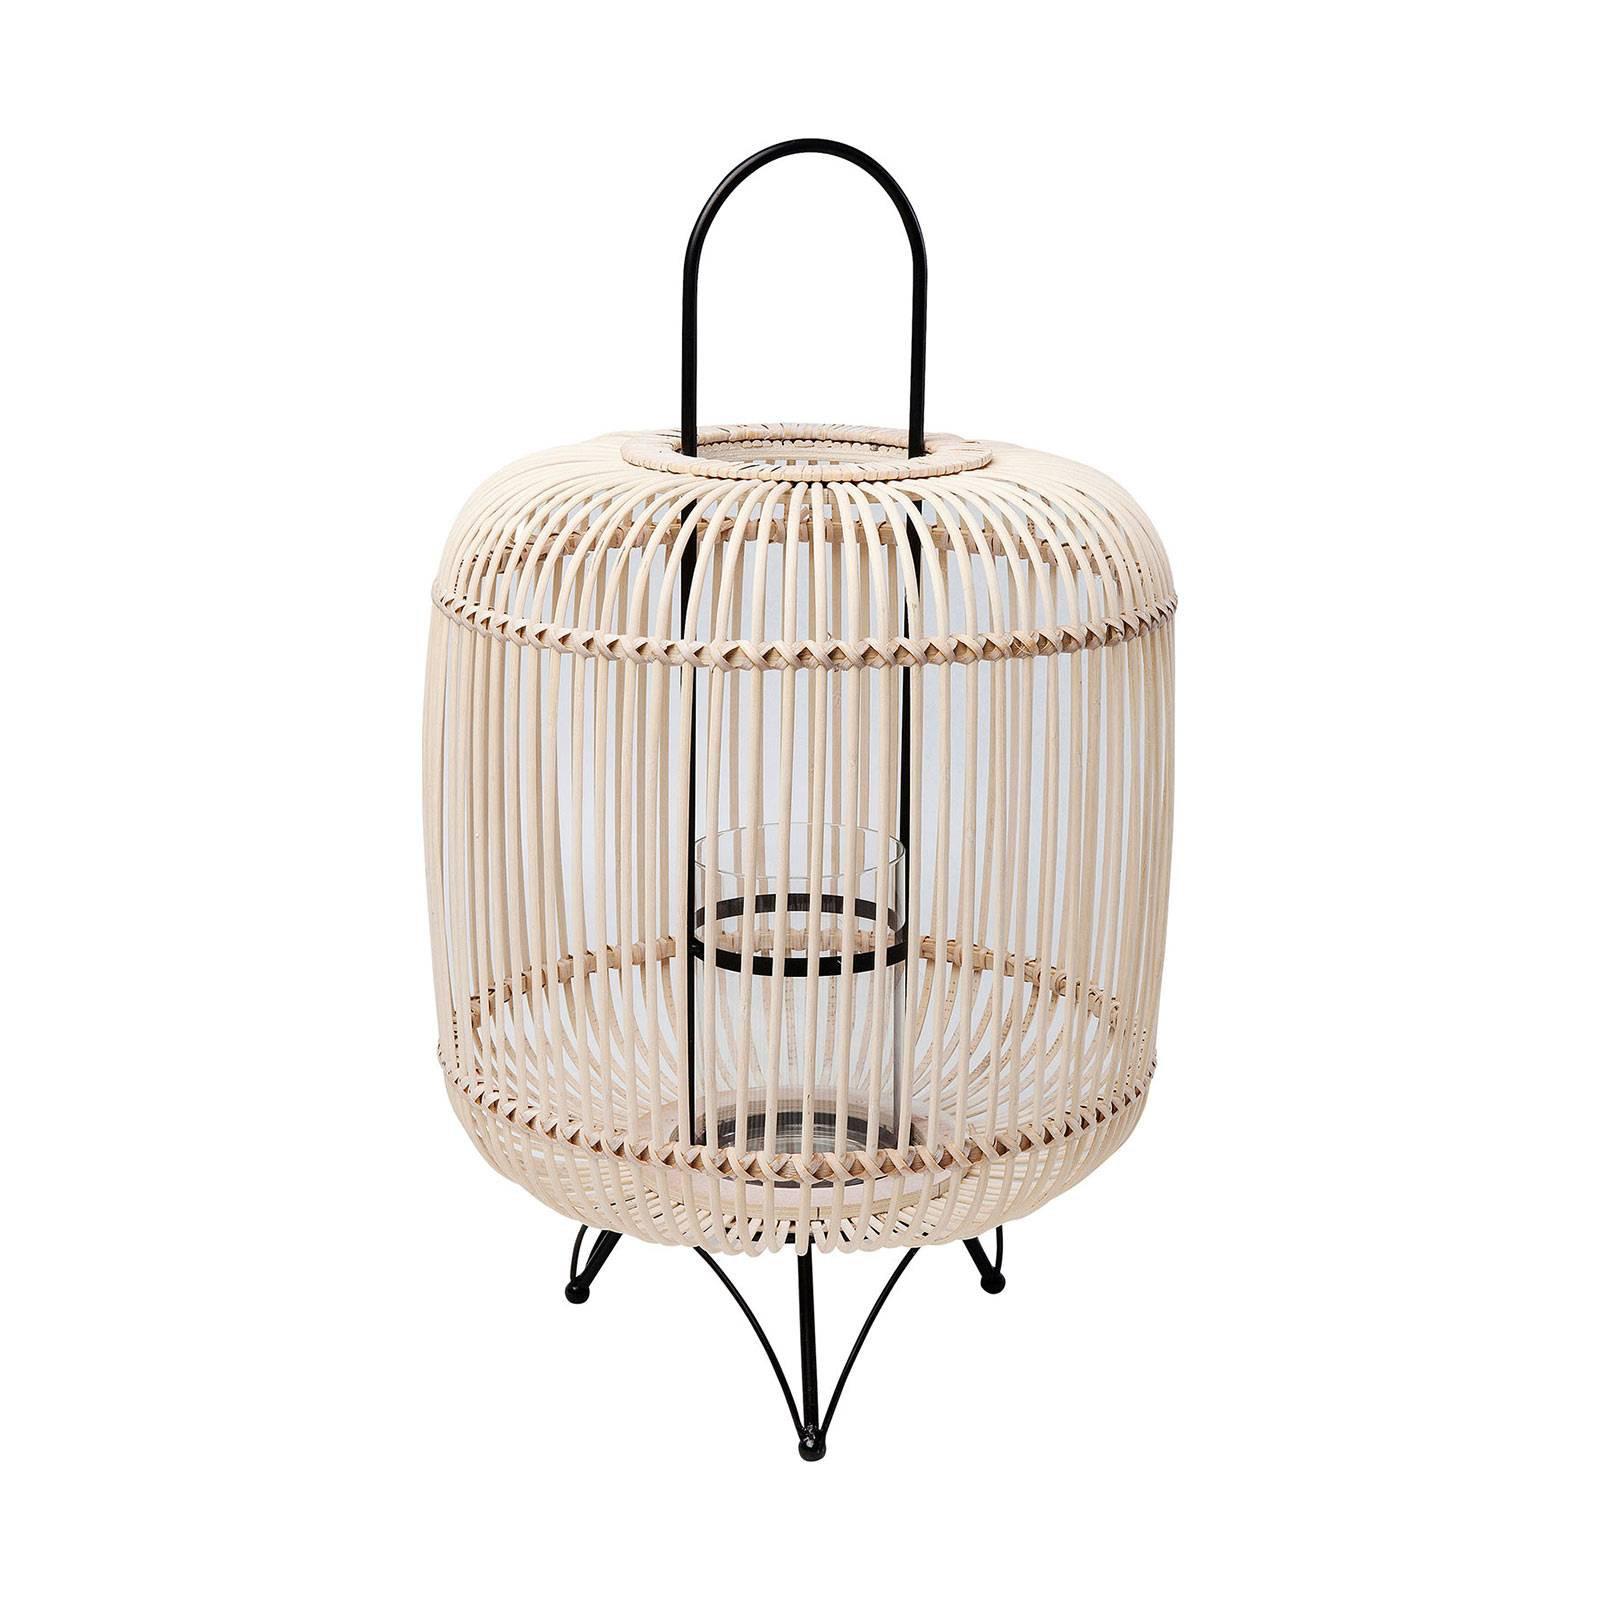 KARE Bambus bordlampe 62 cm